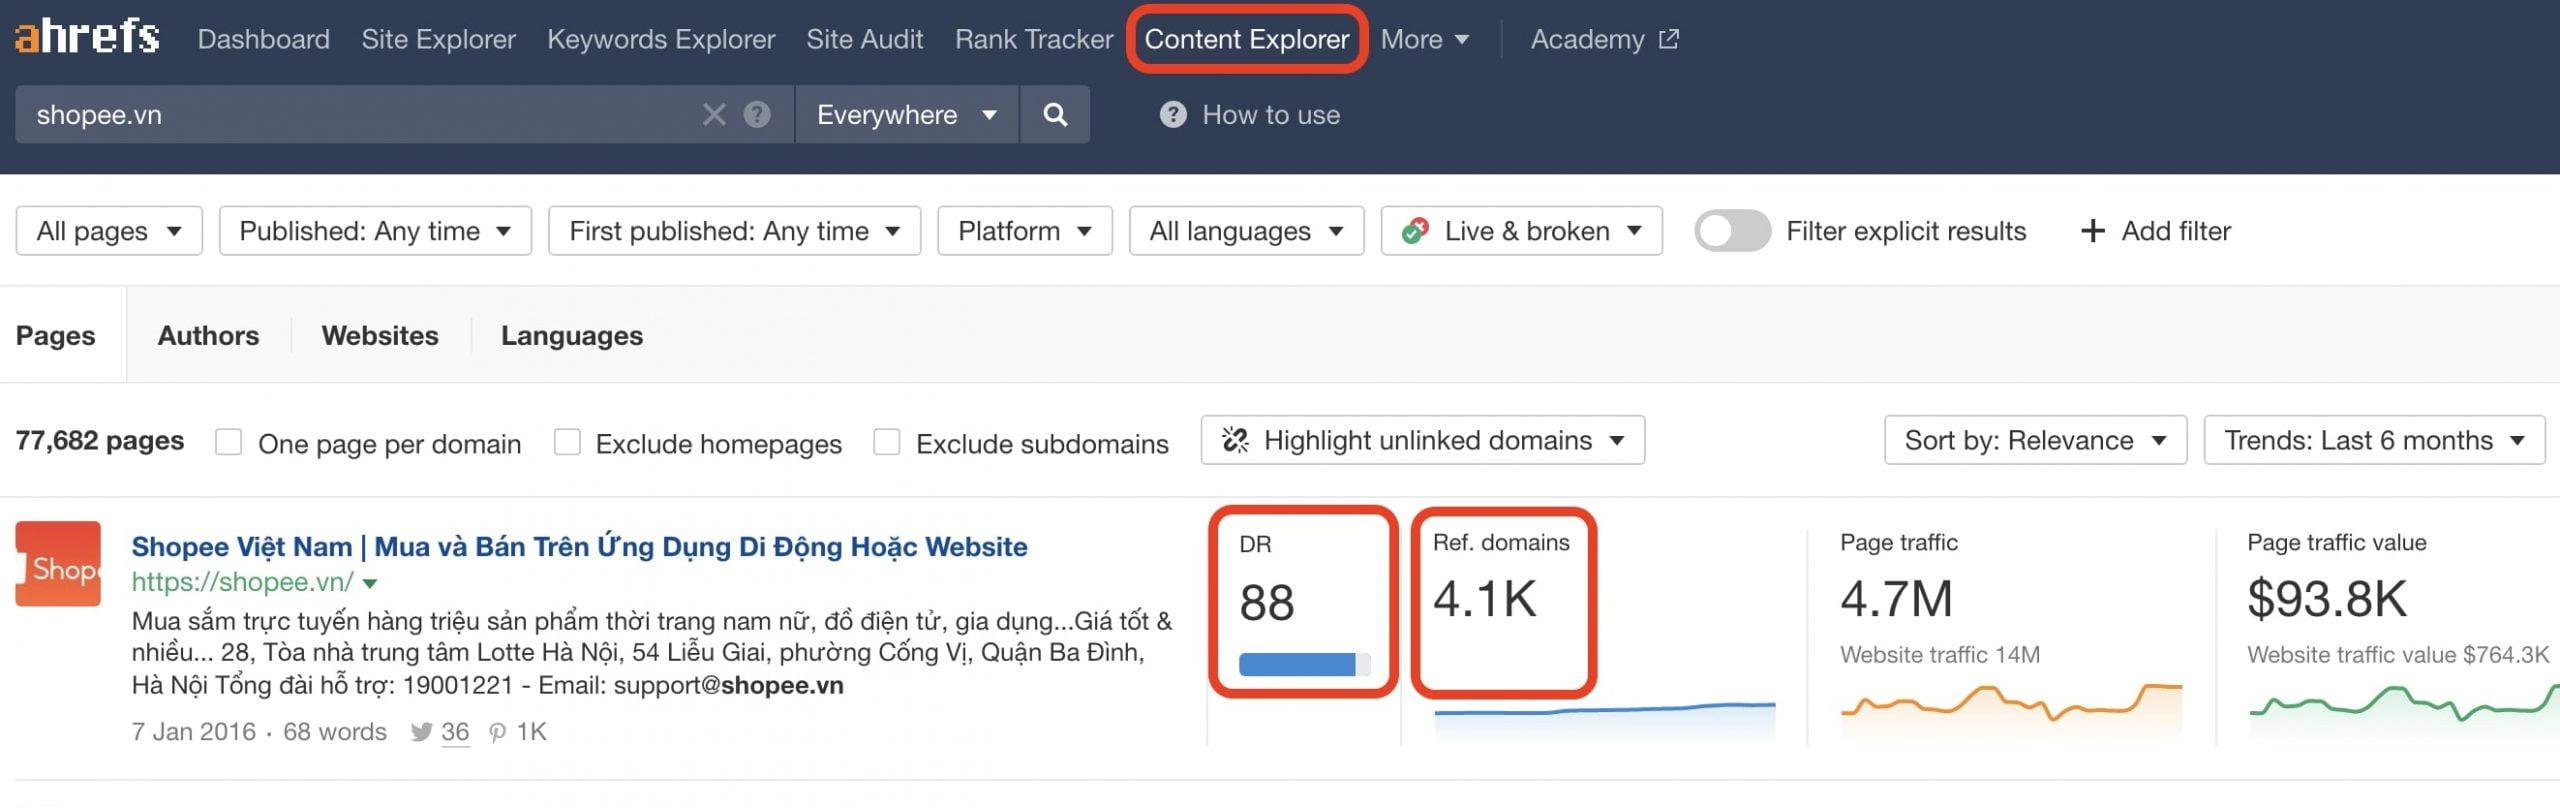 Ahrefs Content Explorer hỗ trợ làm nội dung